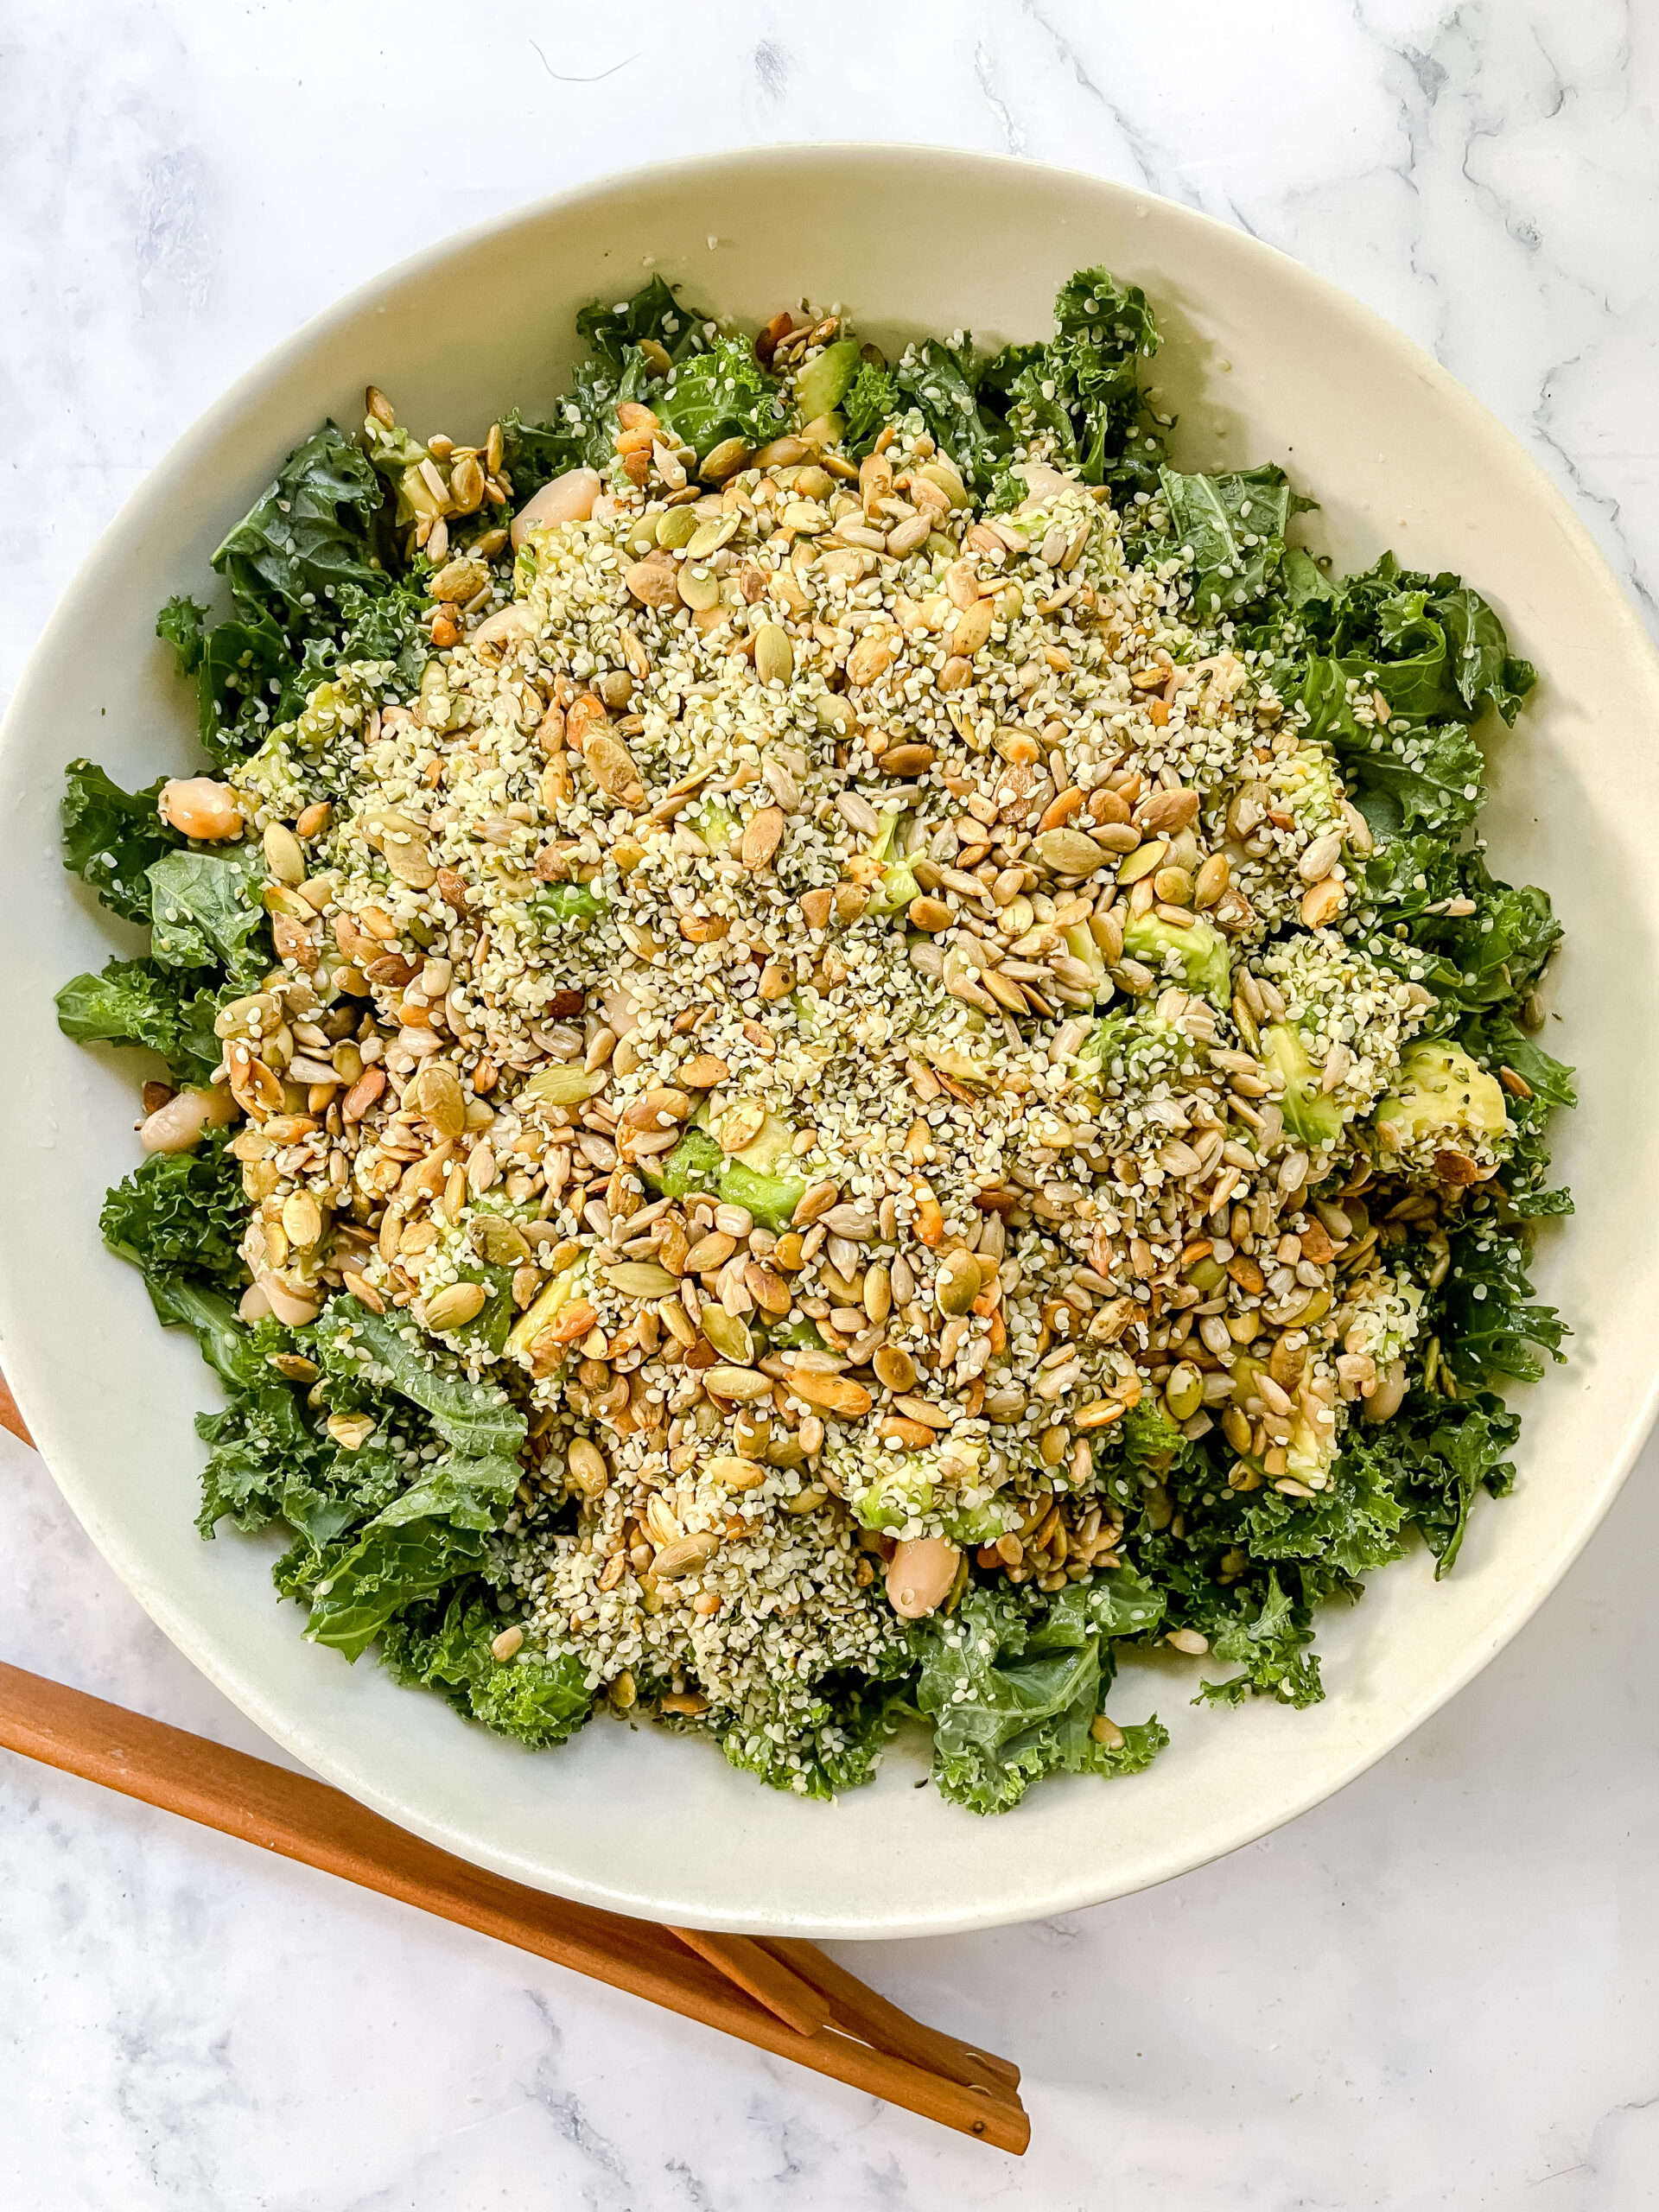 Erewhon's Famous Kale + White Bean Salad                     (Vegan, Gluten Free, Refined Sugar Free)